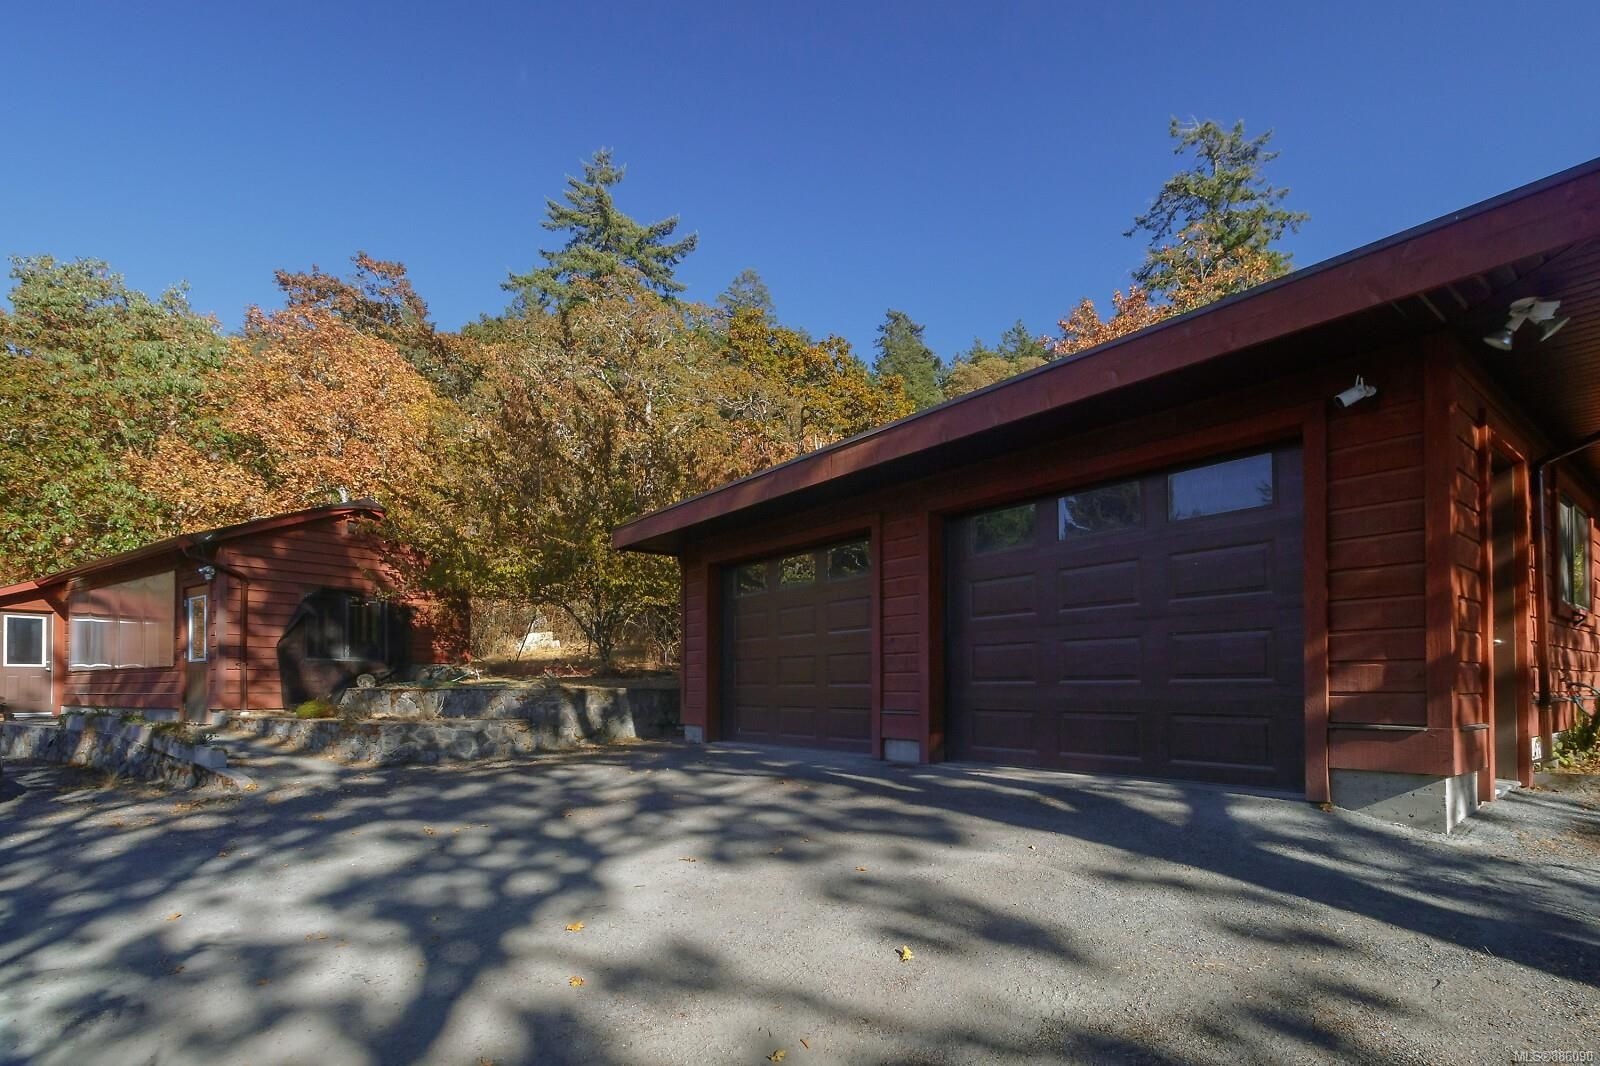 Photo 29: Photos: 4553 Blenkinsop Rd in : SE Blenkinsop House for sale (Saanich East)  : MLS®# 886090